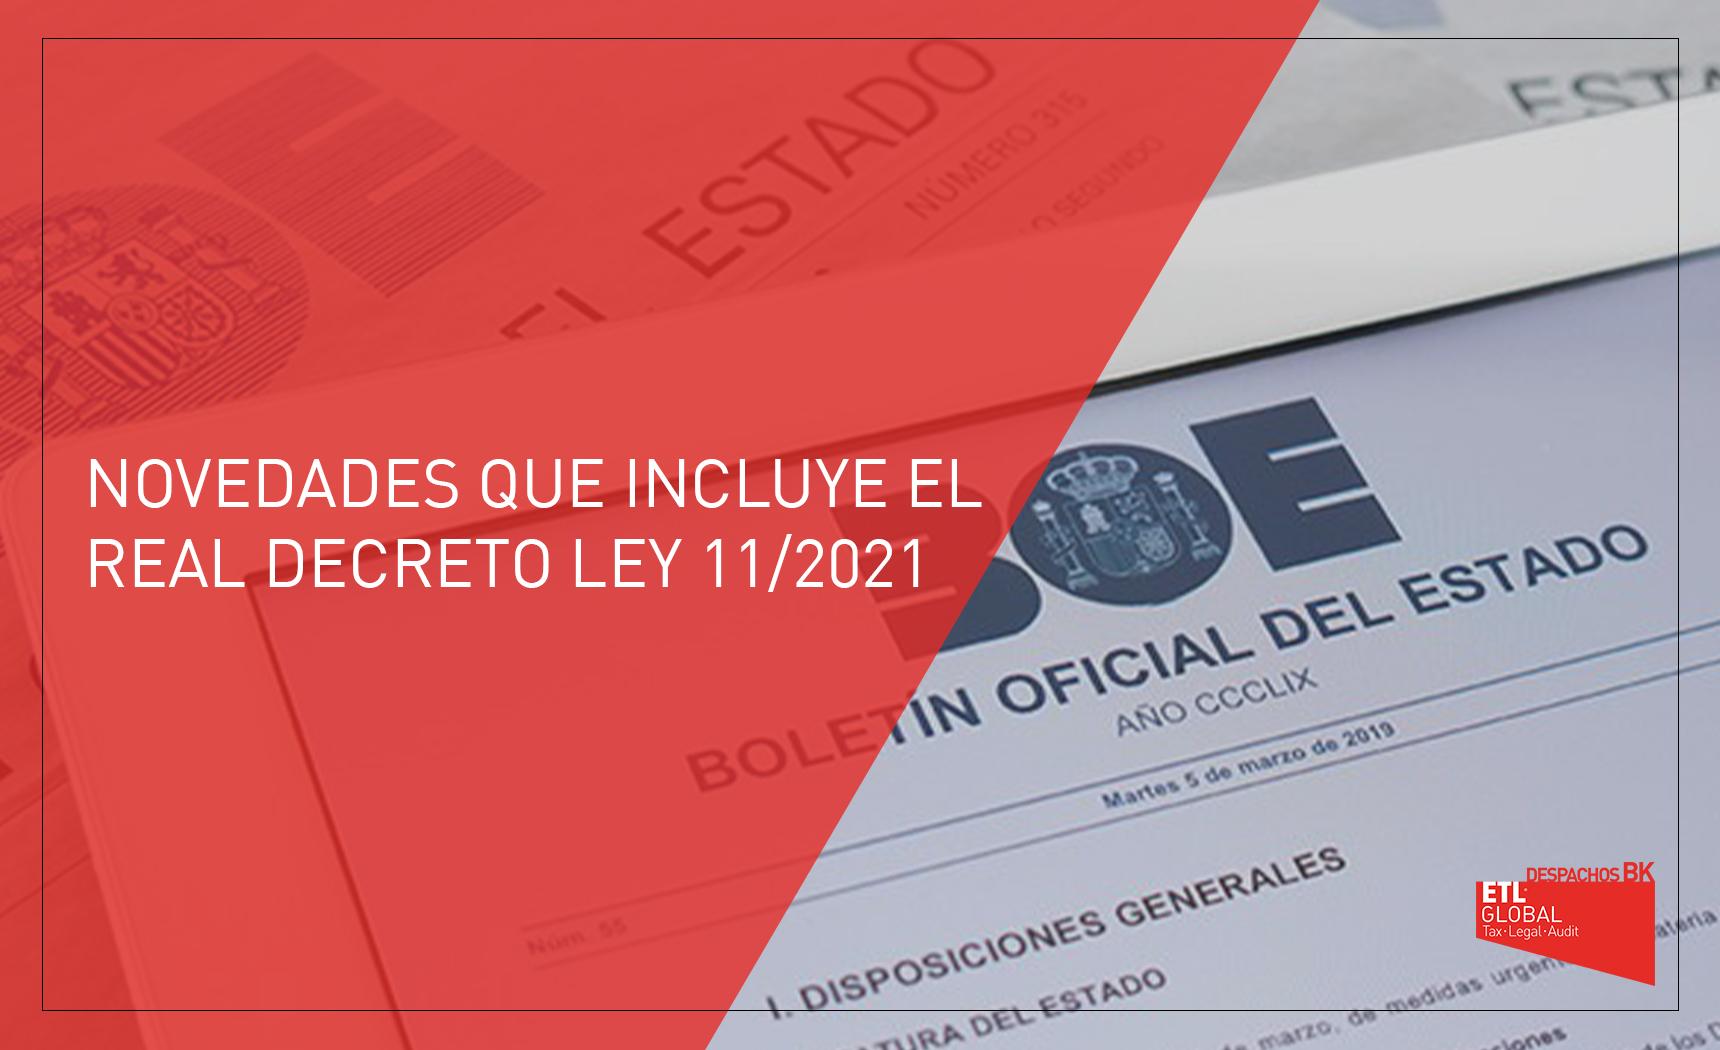 real decreto ley 11/2021